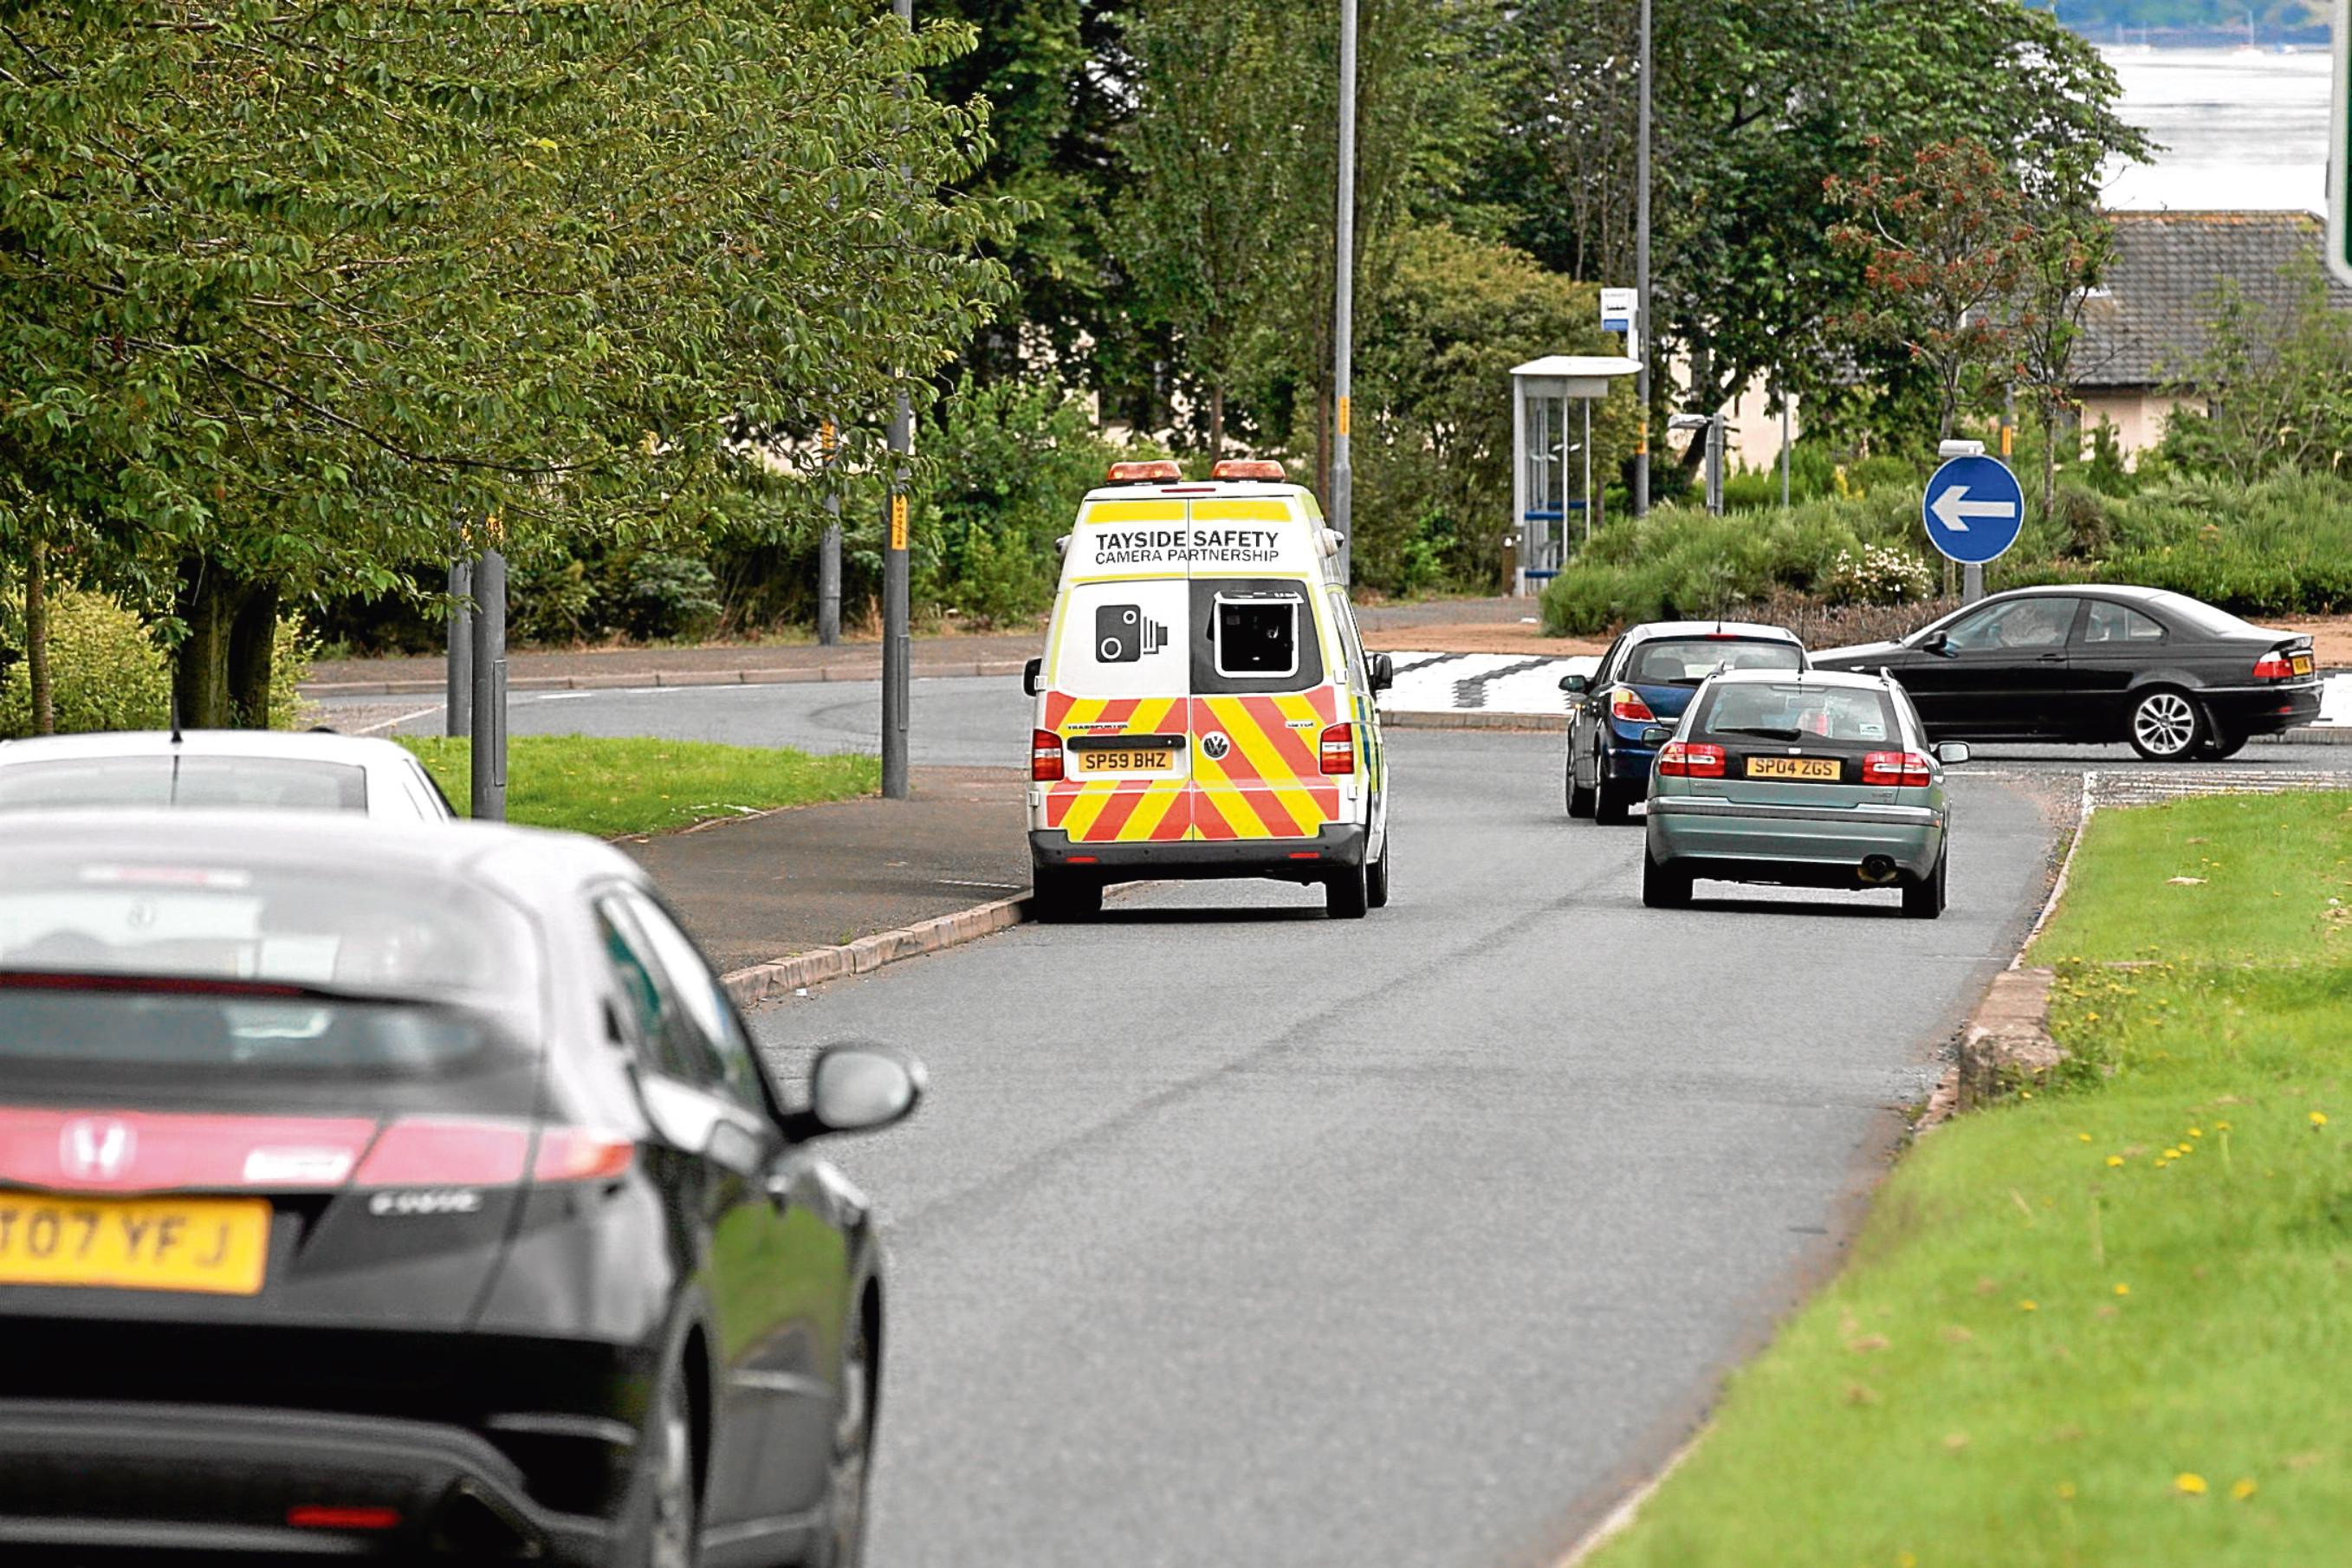 A speed camera van on Dundee's Greendykes Road.